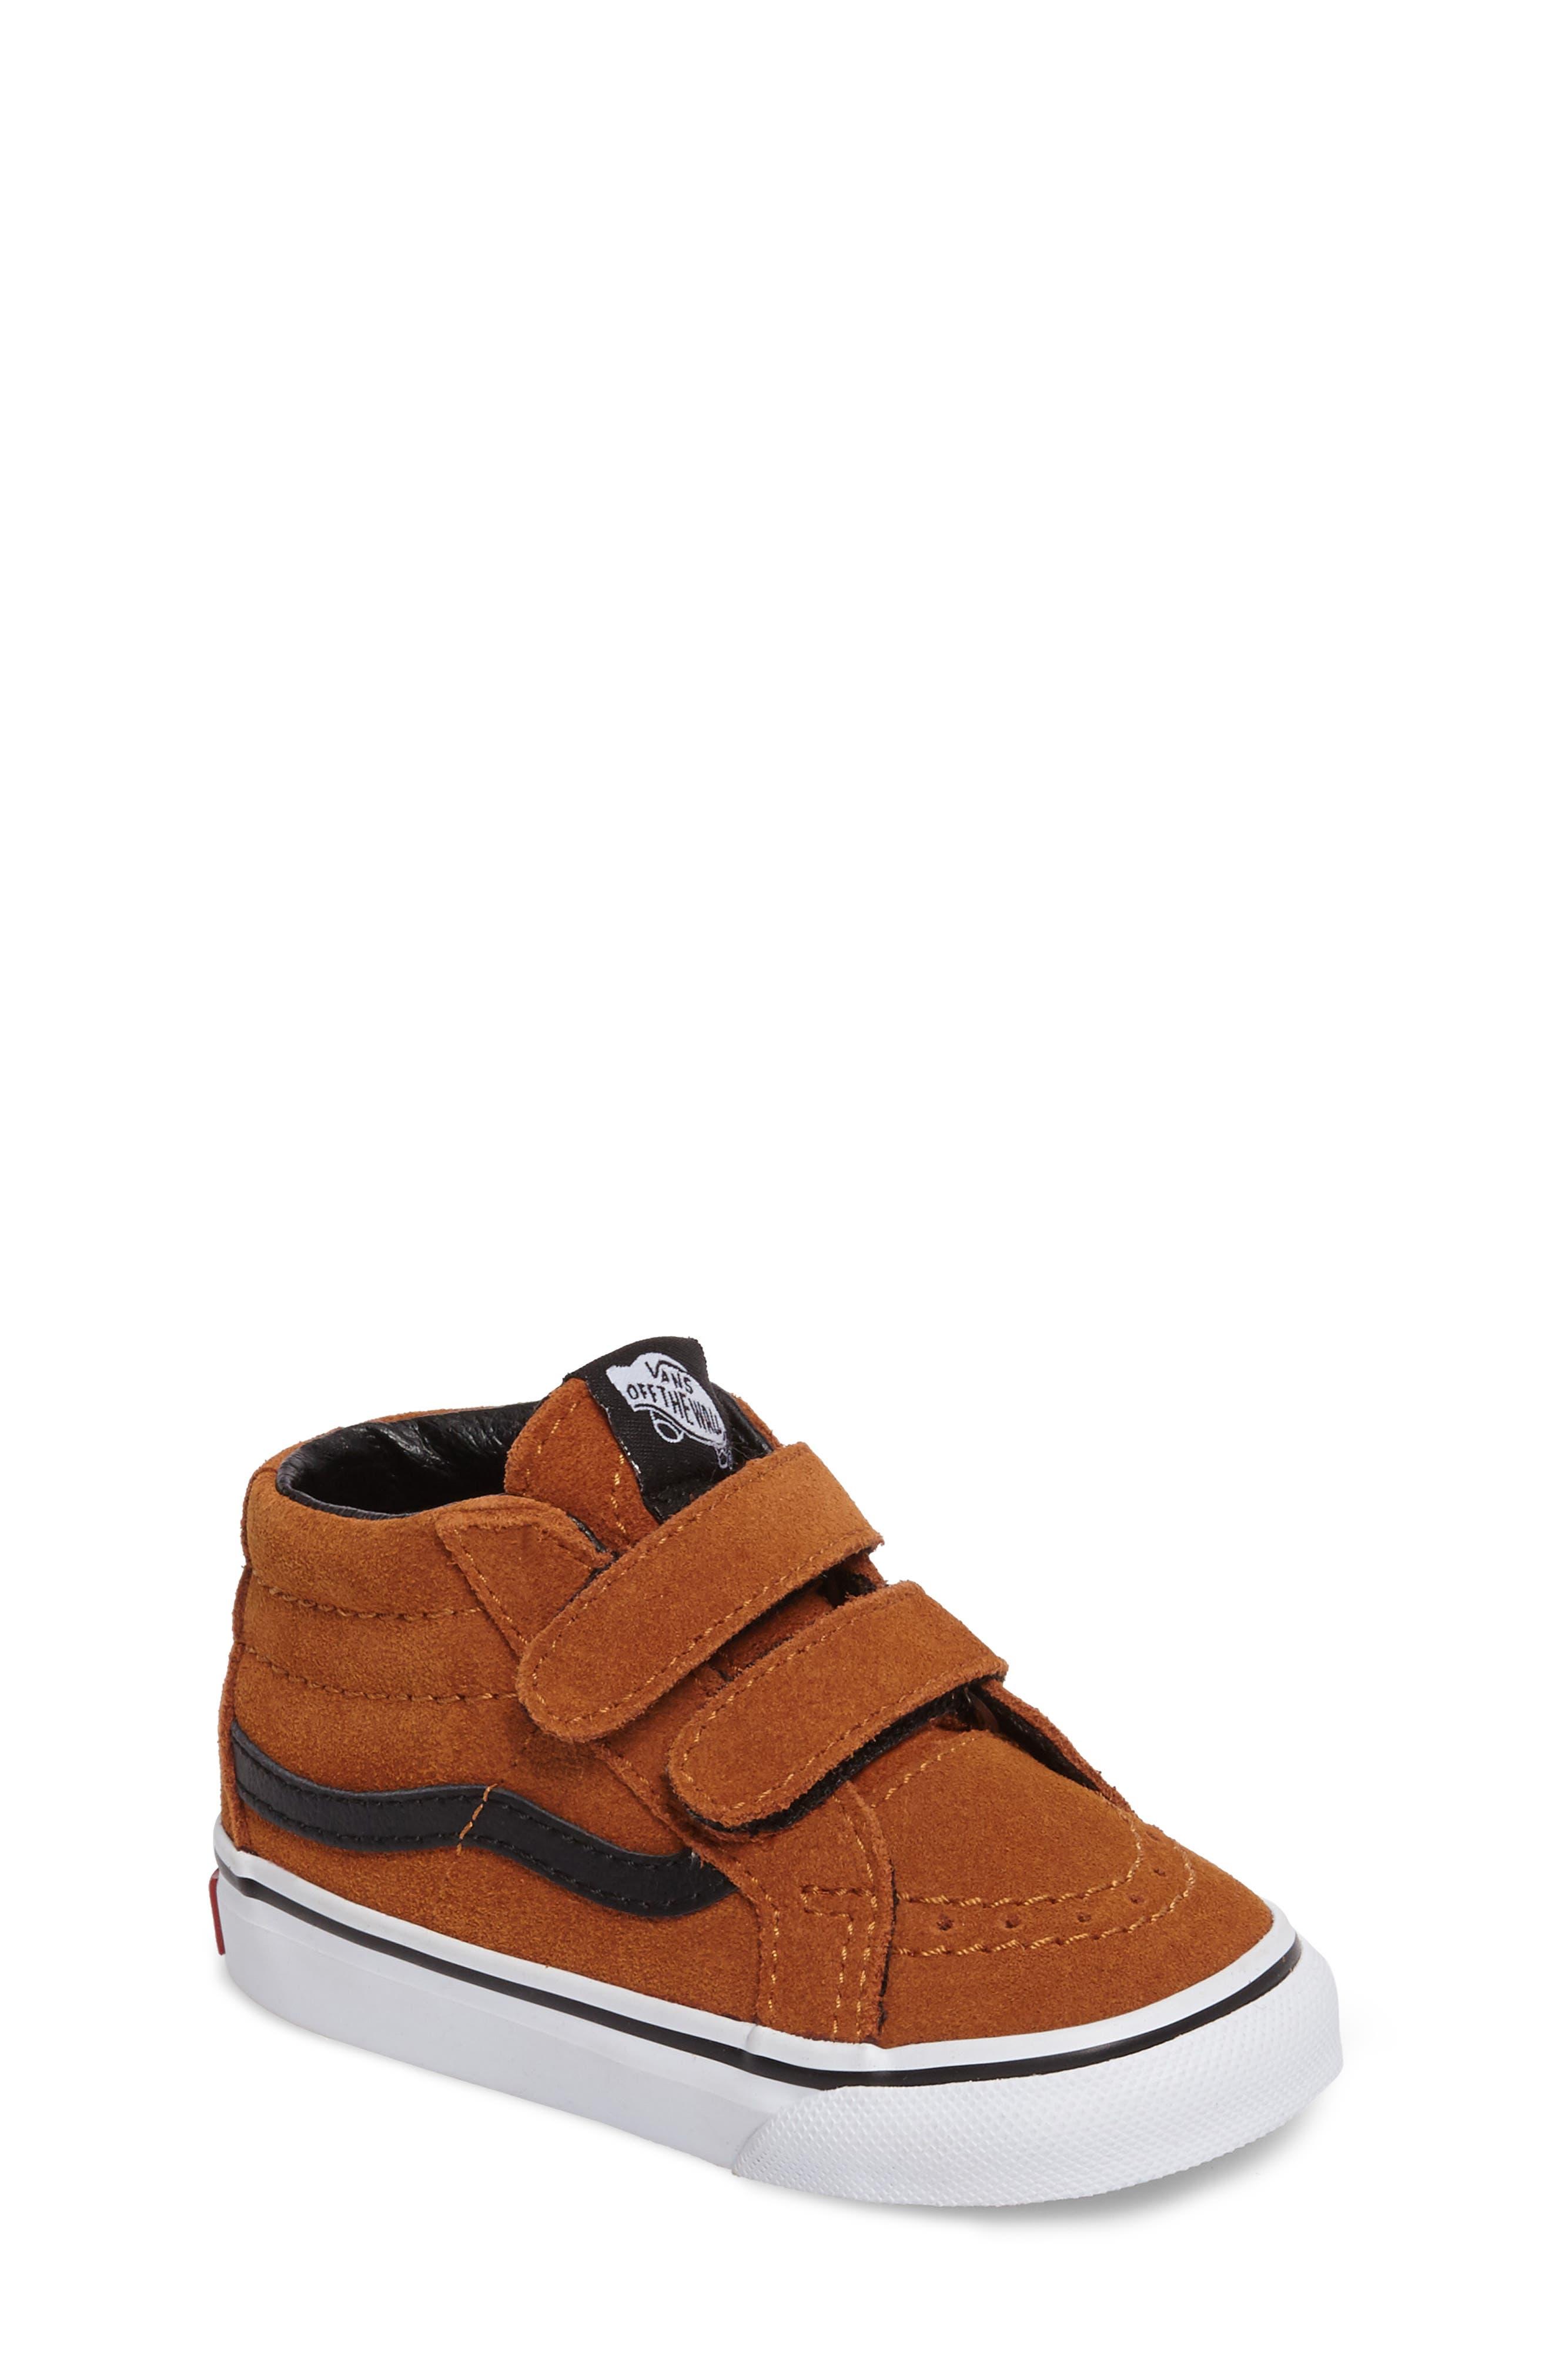 SK8-Mid Reissue Sneaker,                             Main thumbnail 1, color,                             200